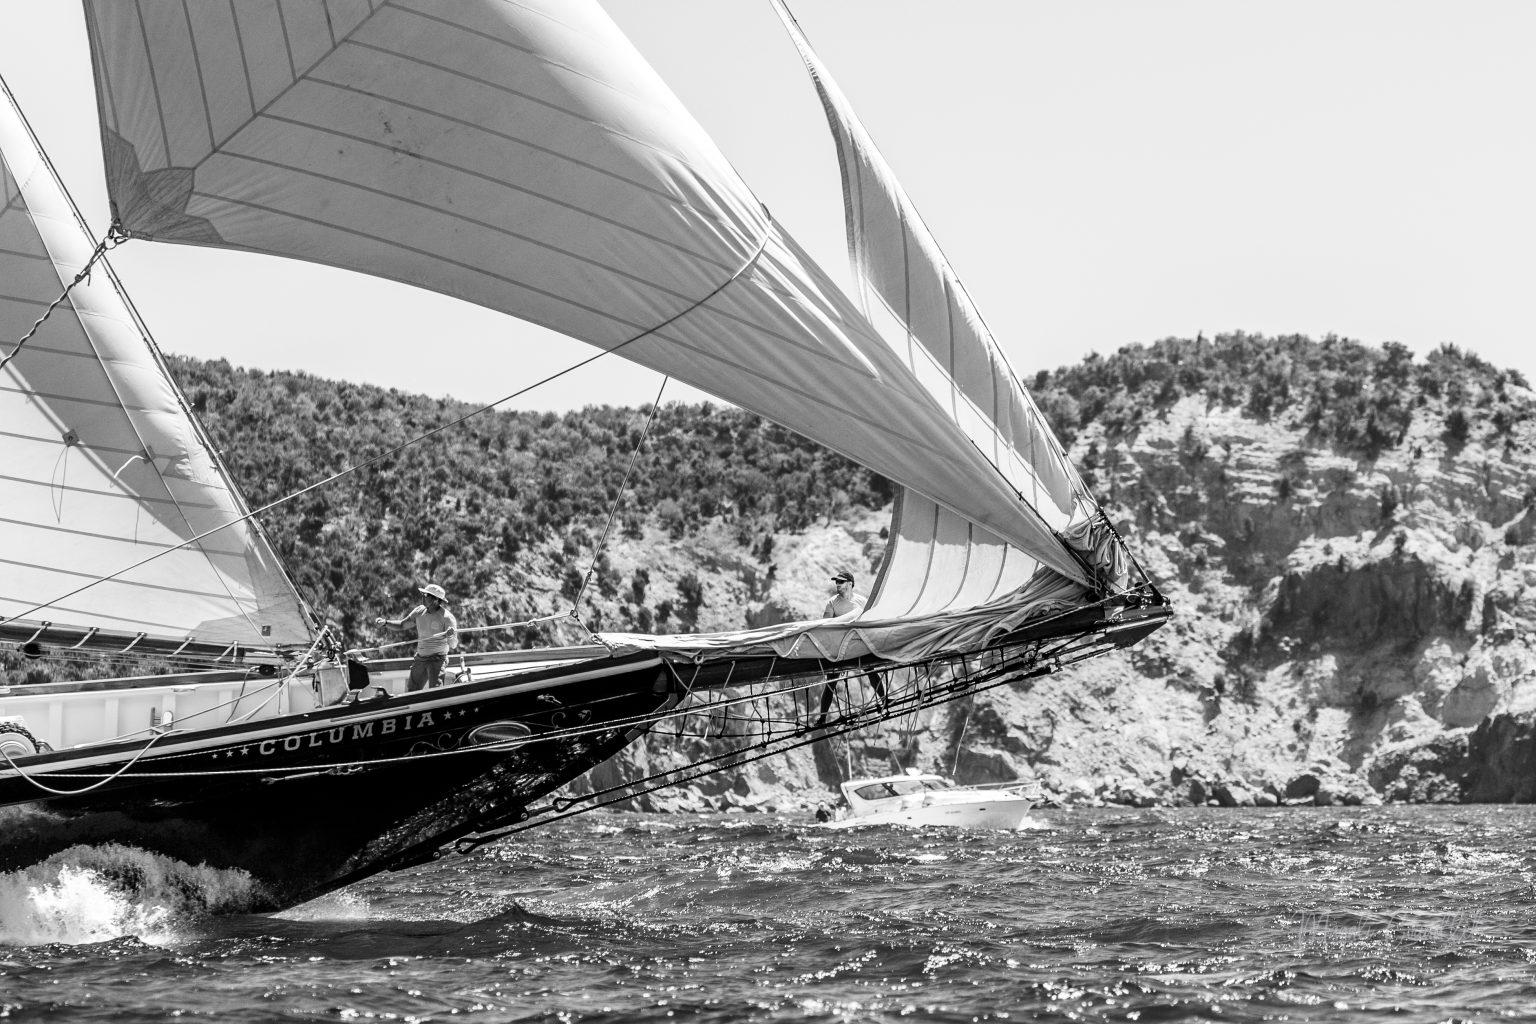 Columbia yacht, Bucket Regatta 2019 St Barths-1